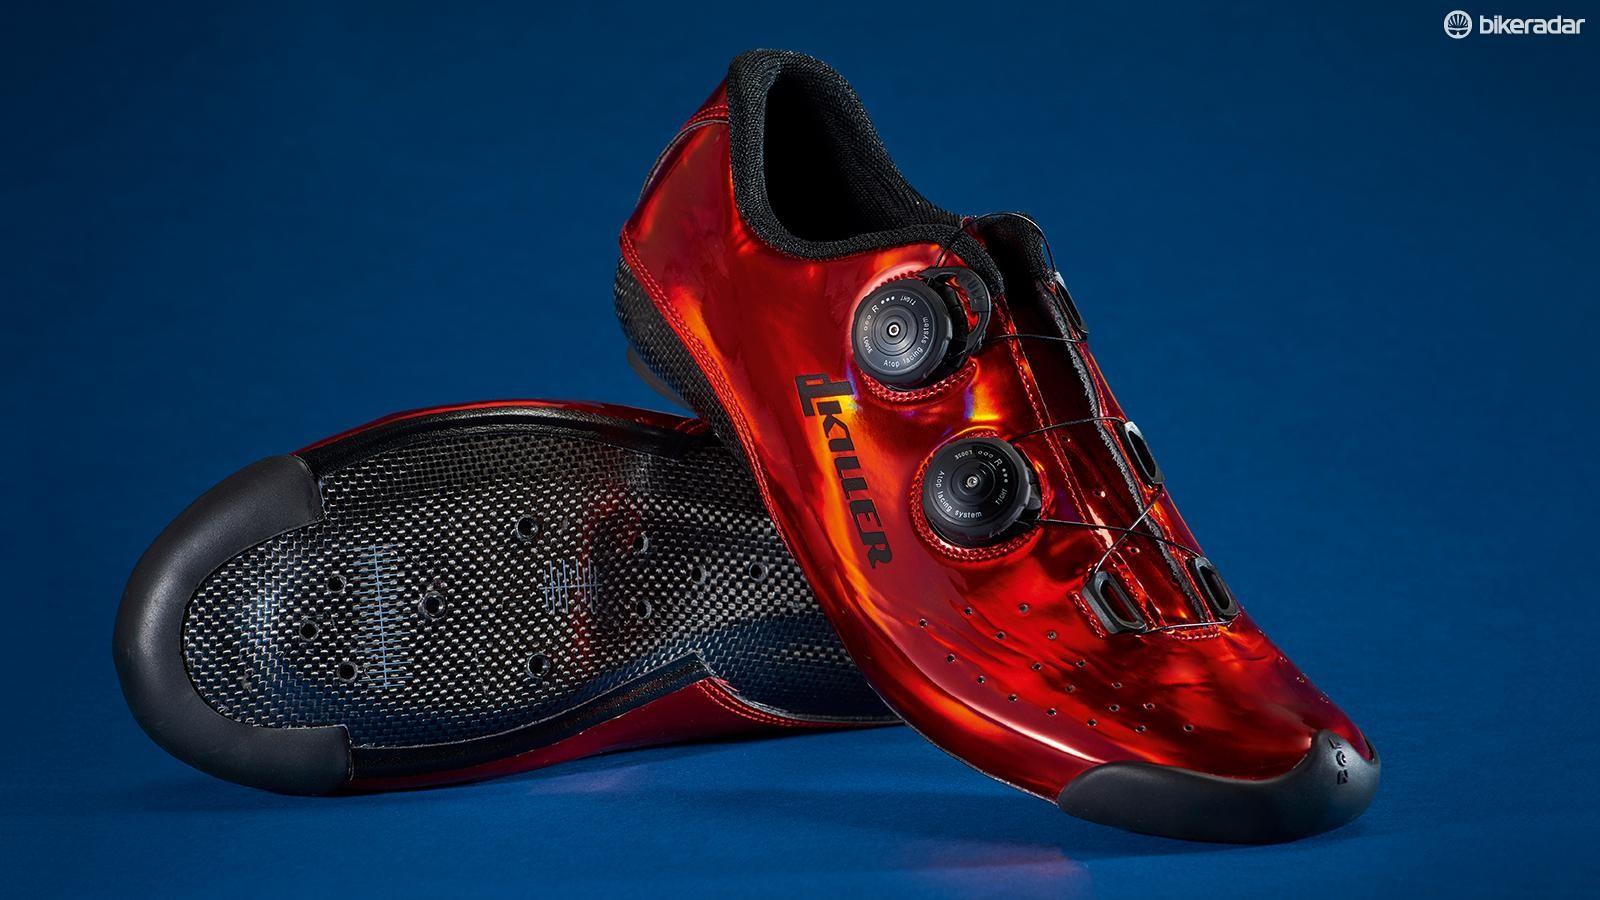 DL Killer's KS1 shoes